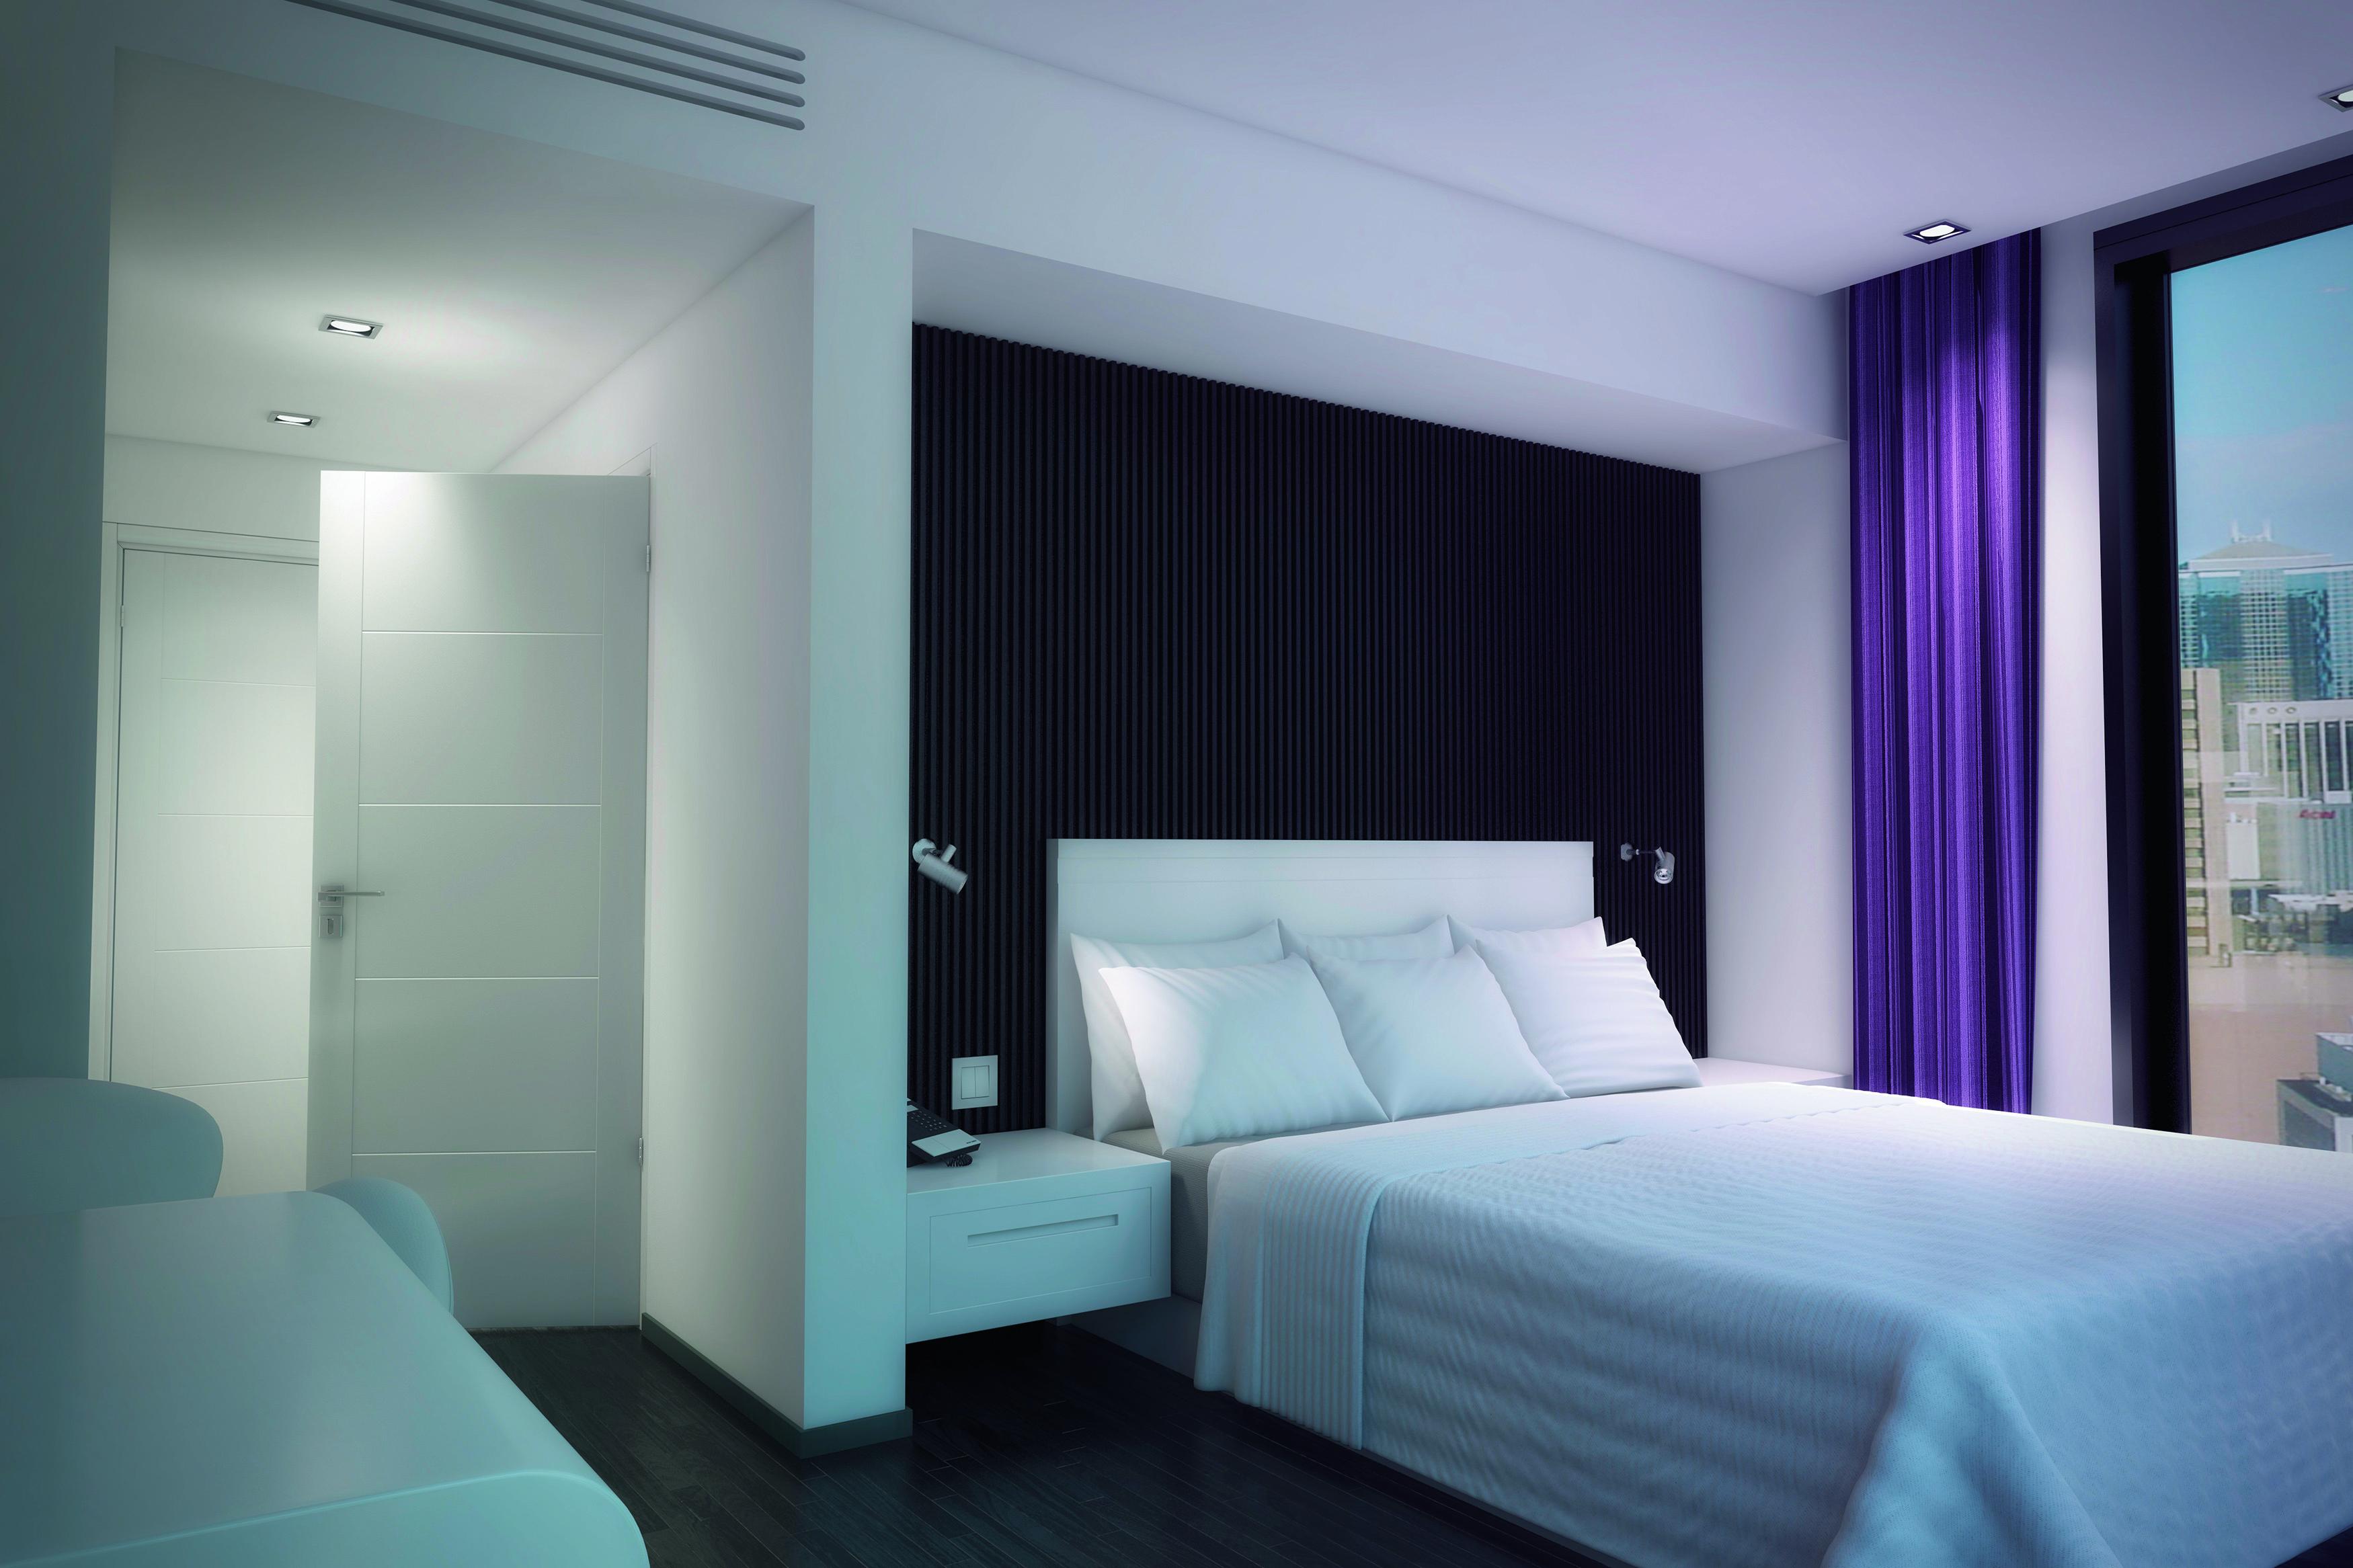 JUNG_Hotel_02